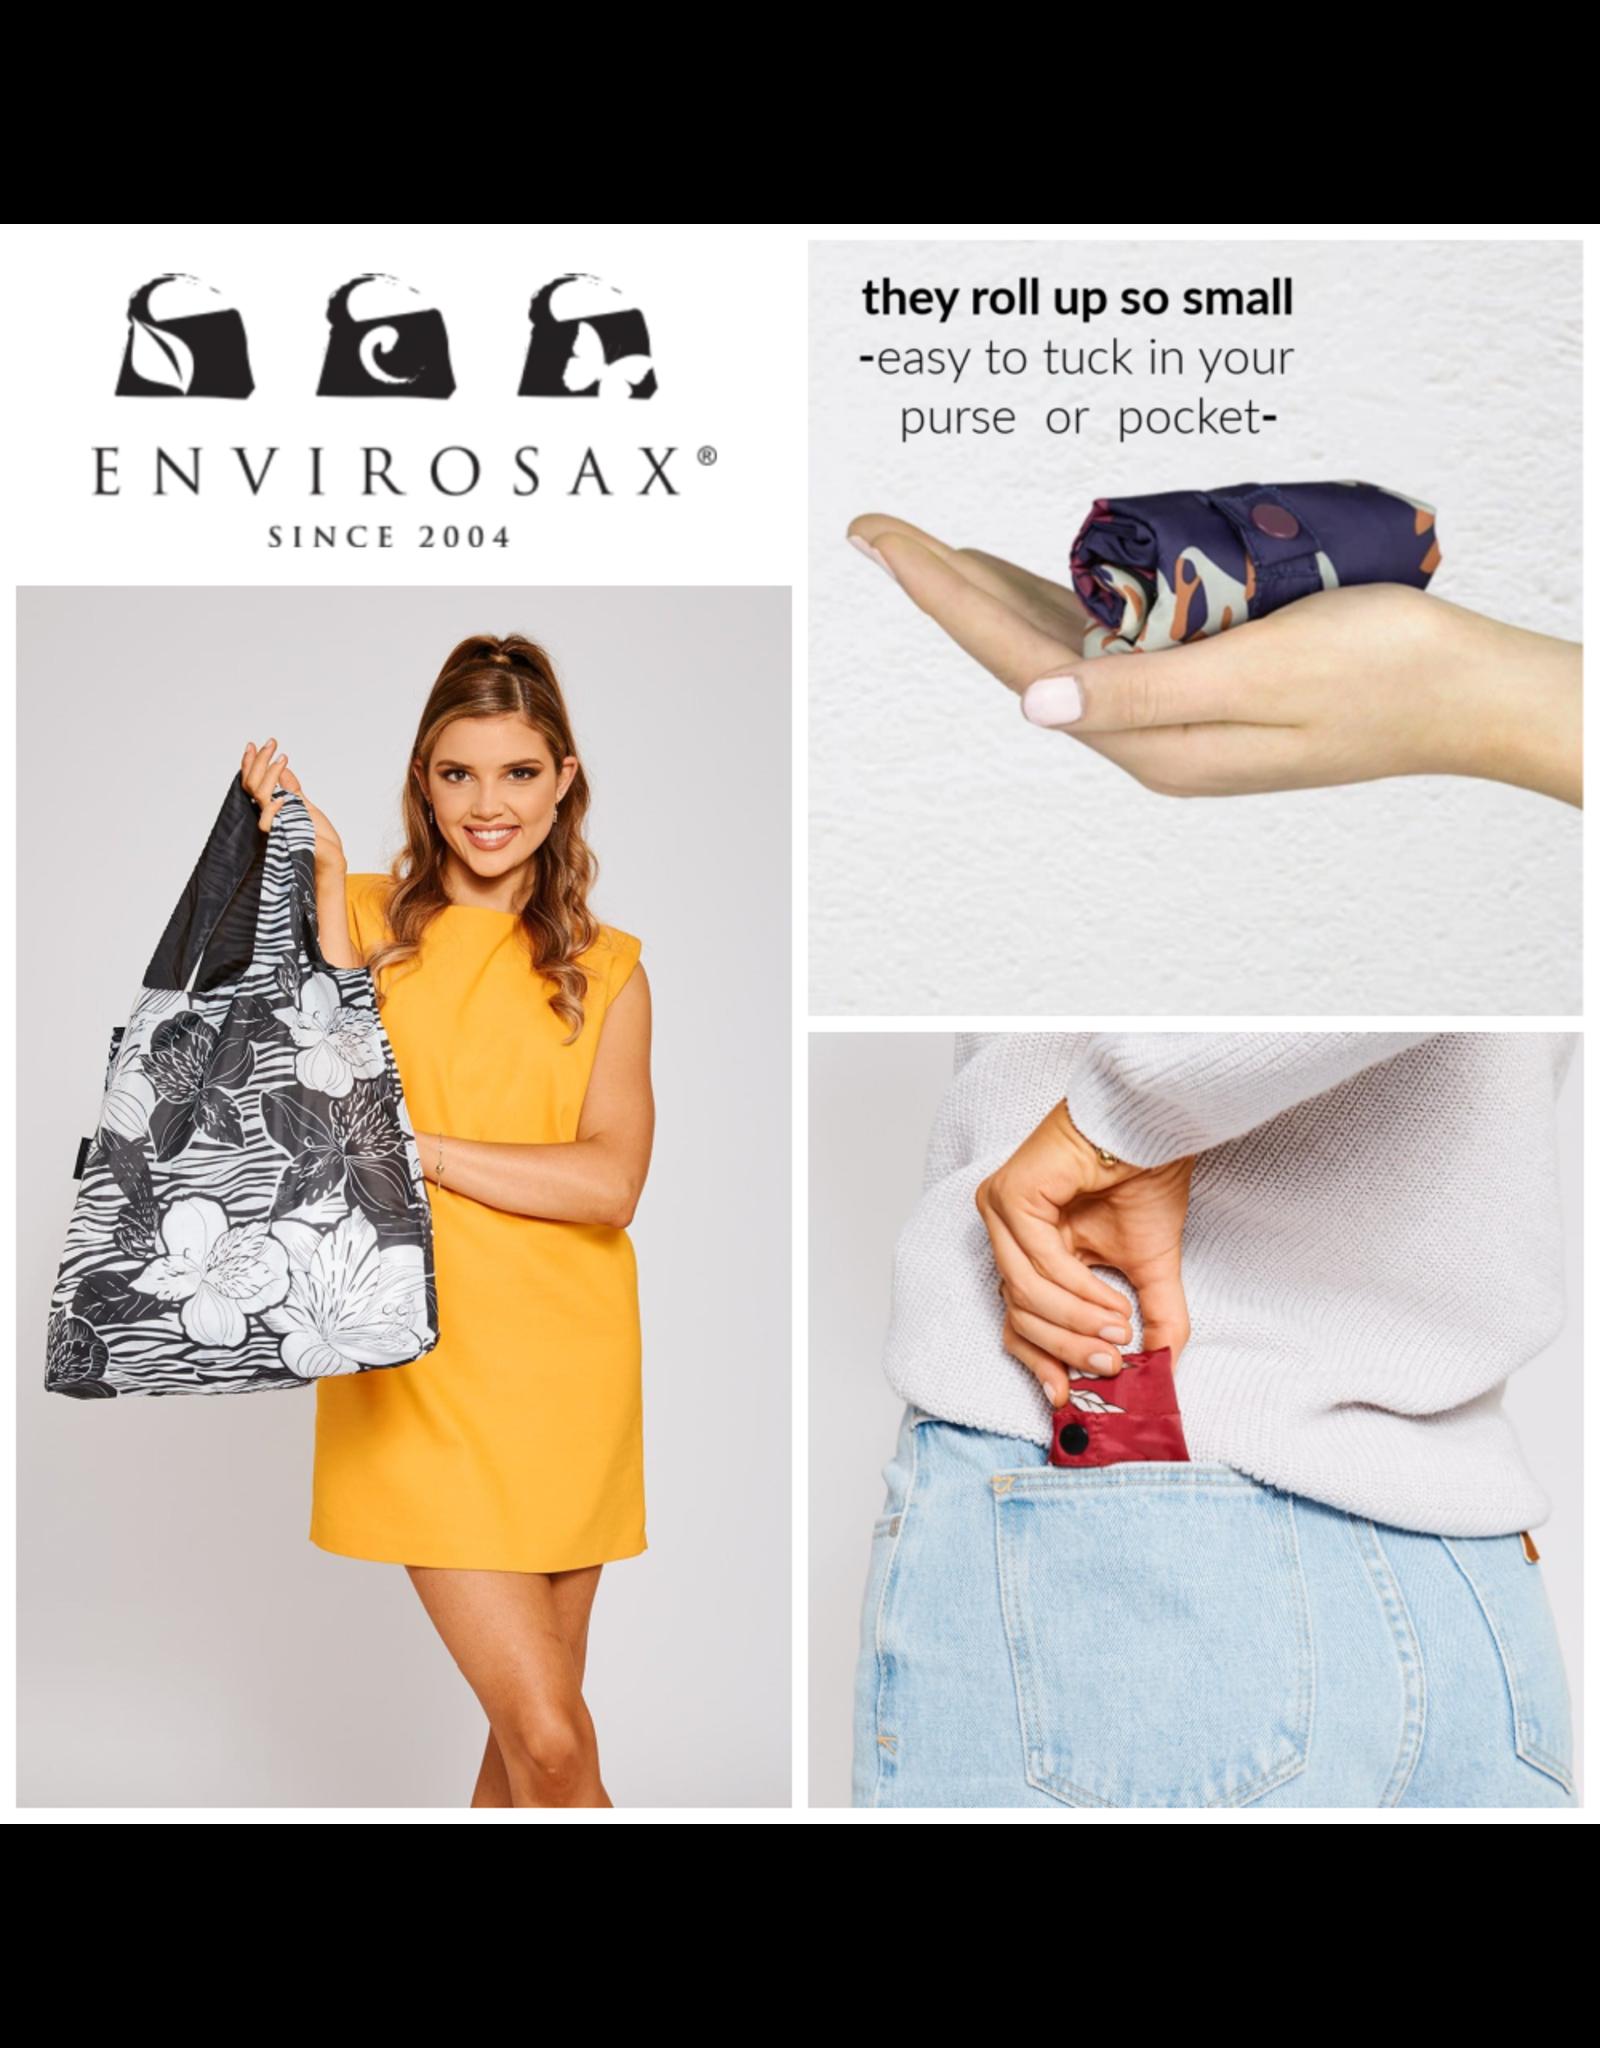 Envirosax Tropics - Pocket Sized Reusuable Bag from Envirosax